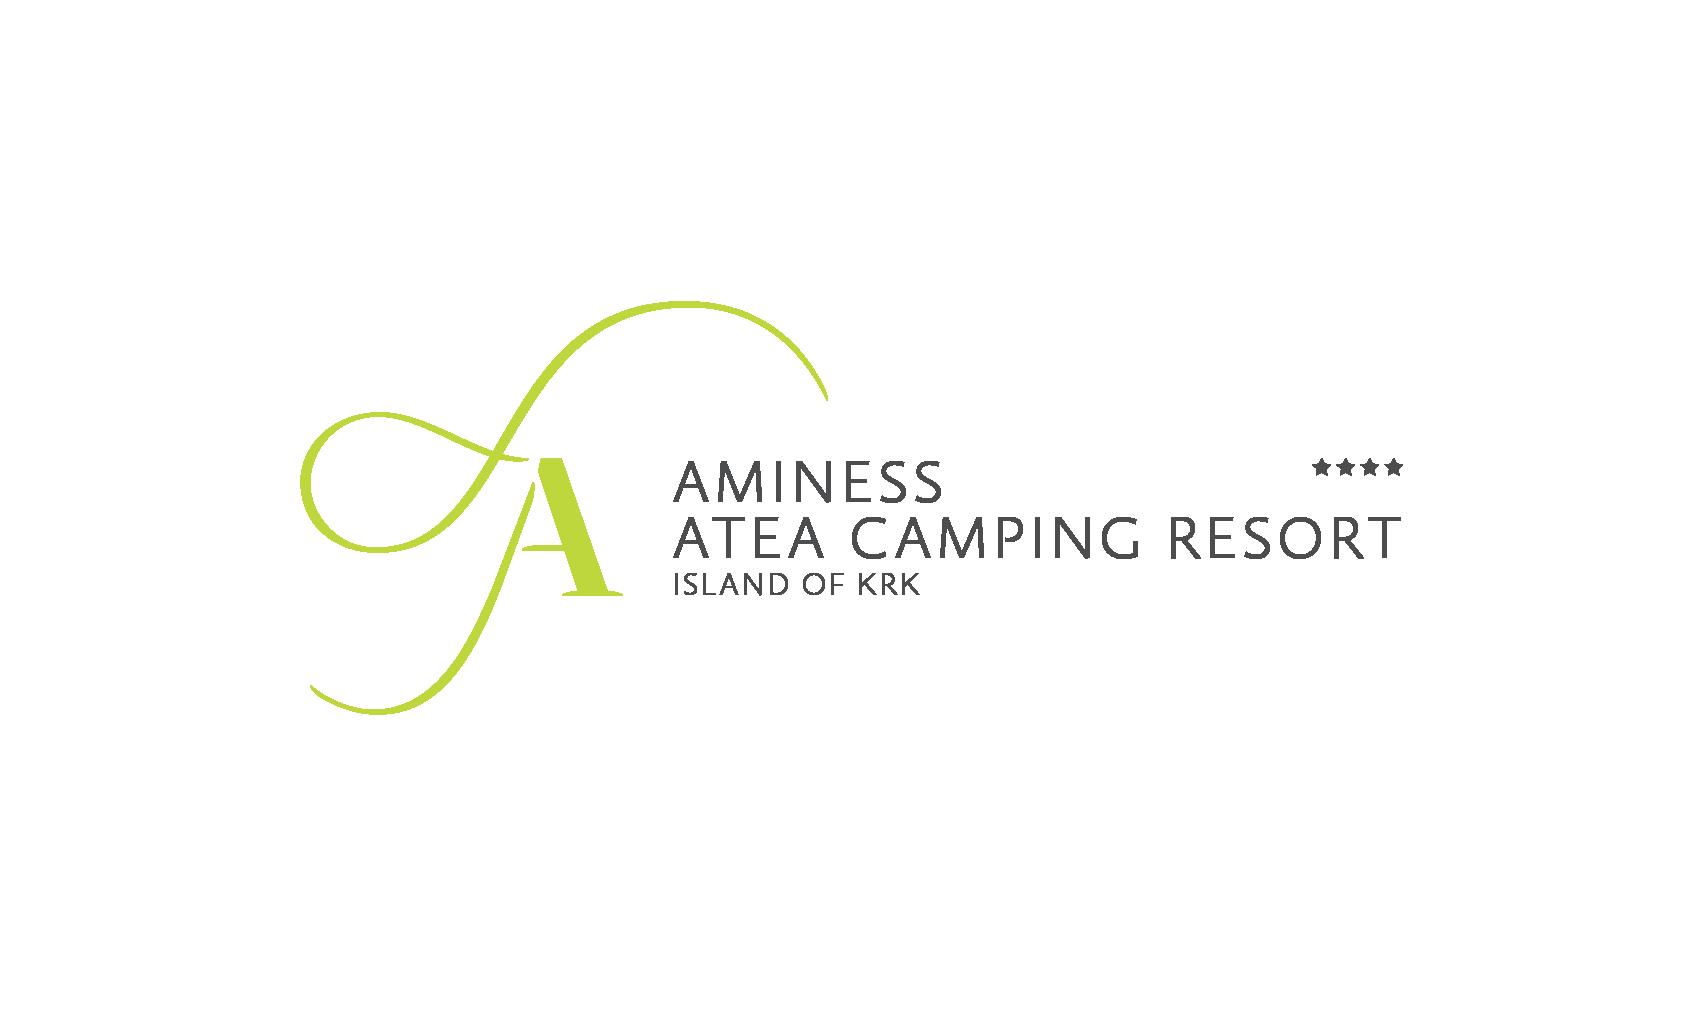 Aminess Atea Camping Resort